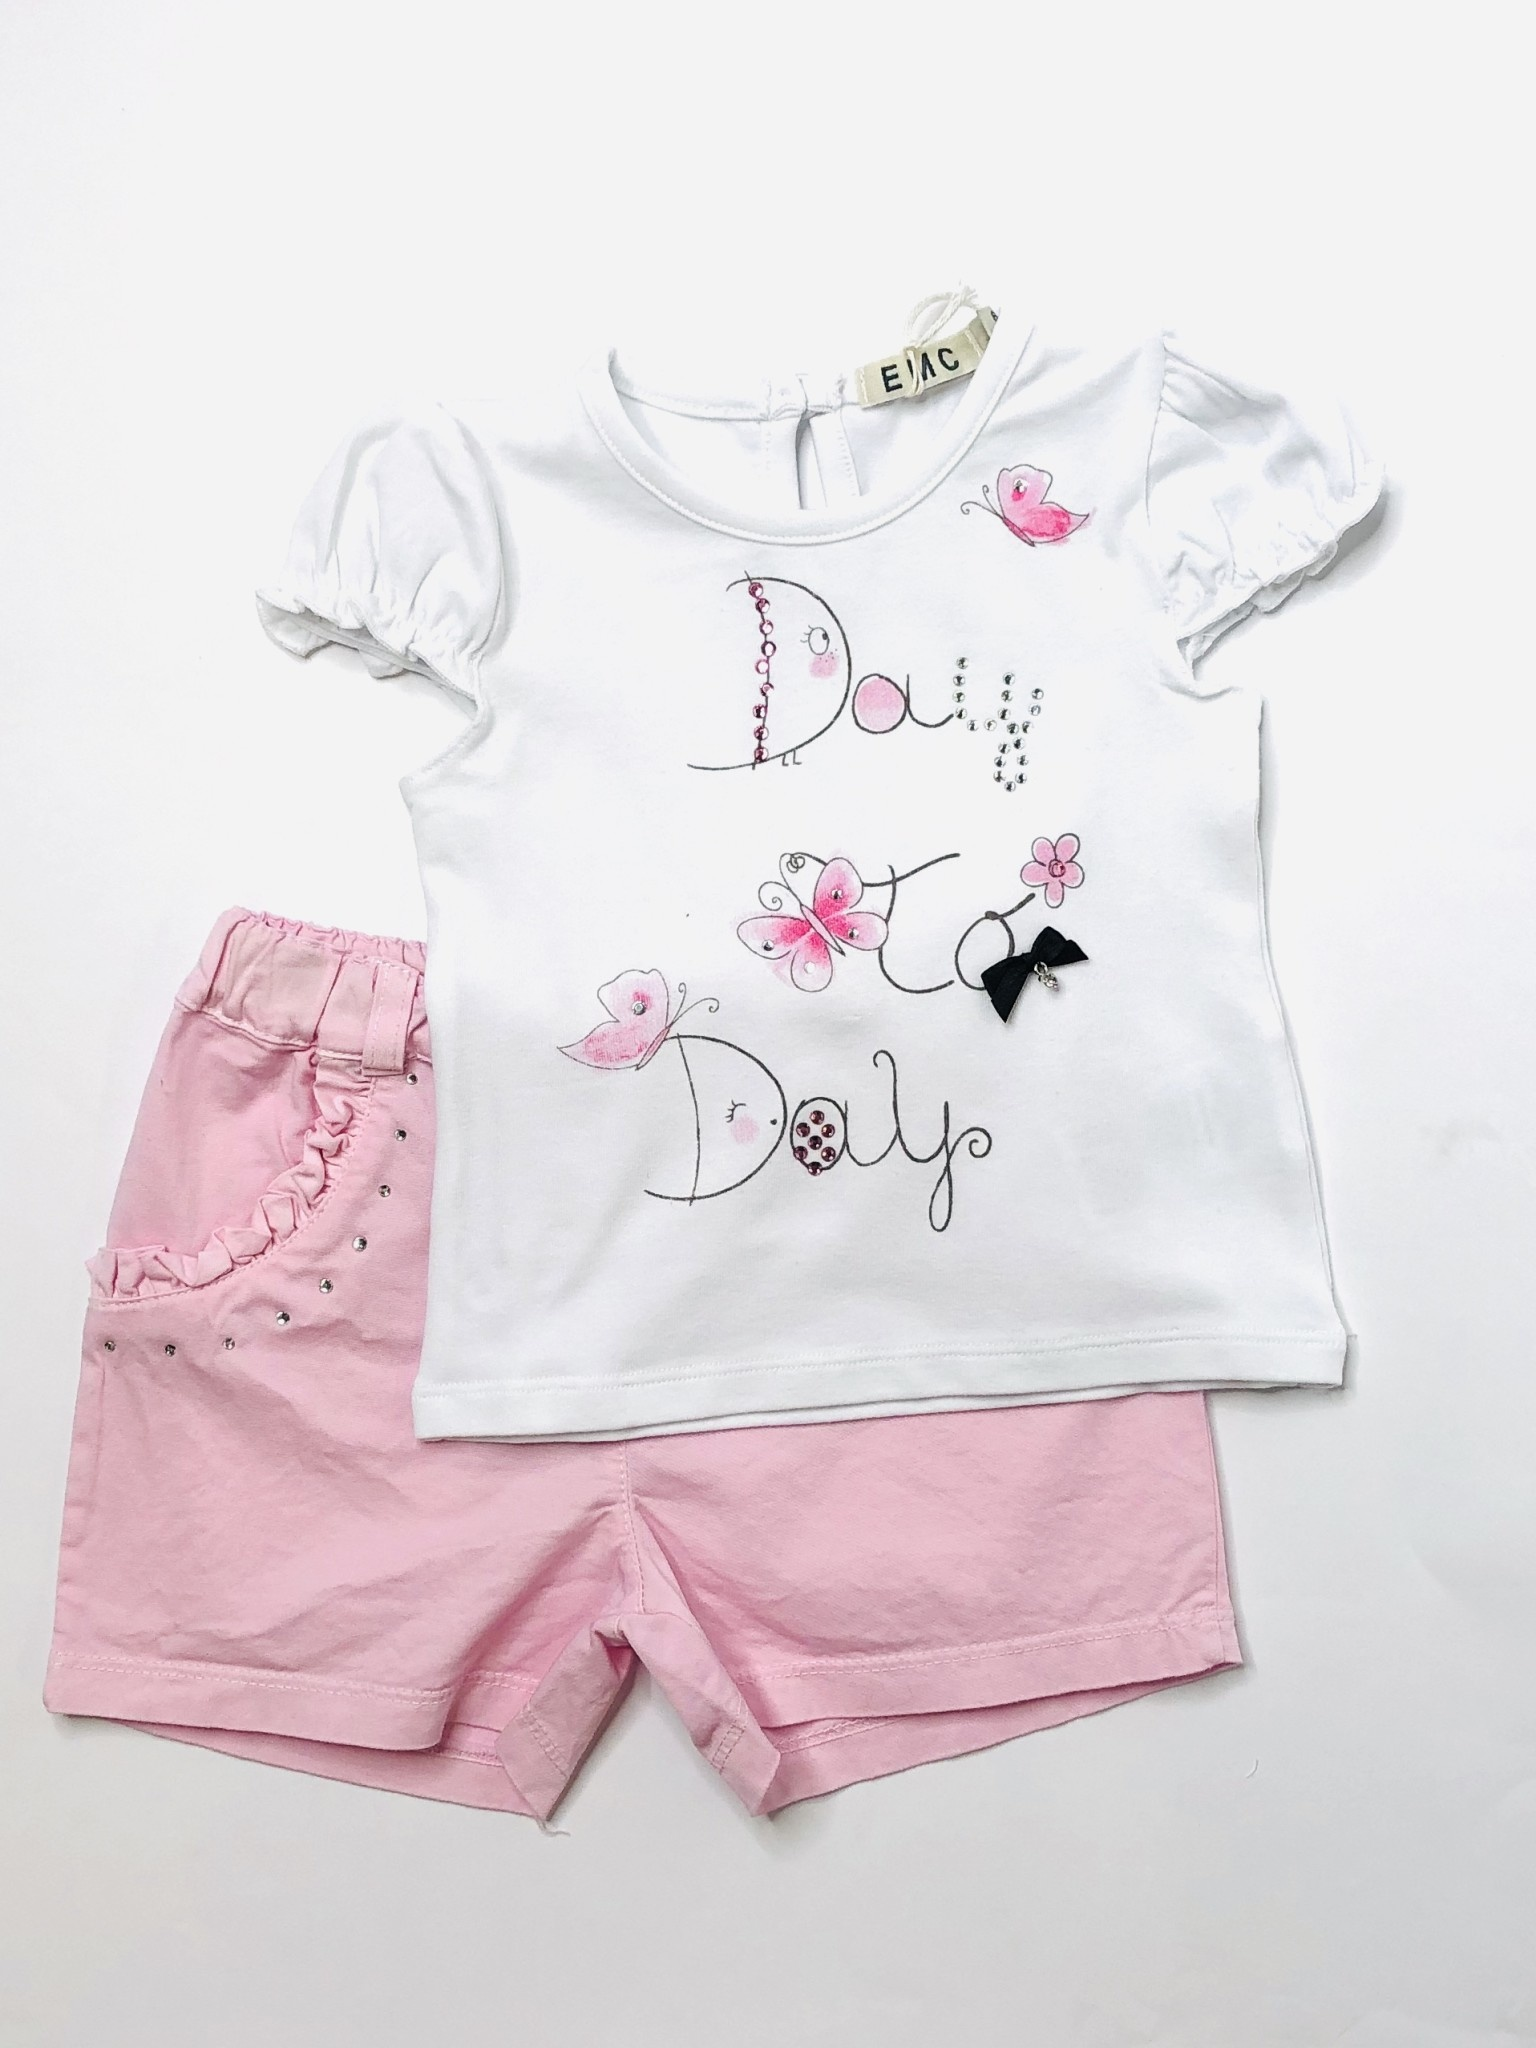 EMC White Butterfly T-shirt & Pink Diamond Short Set